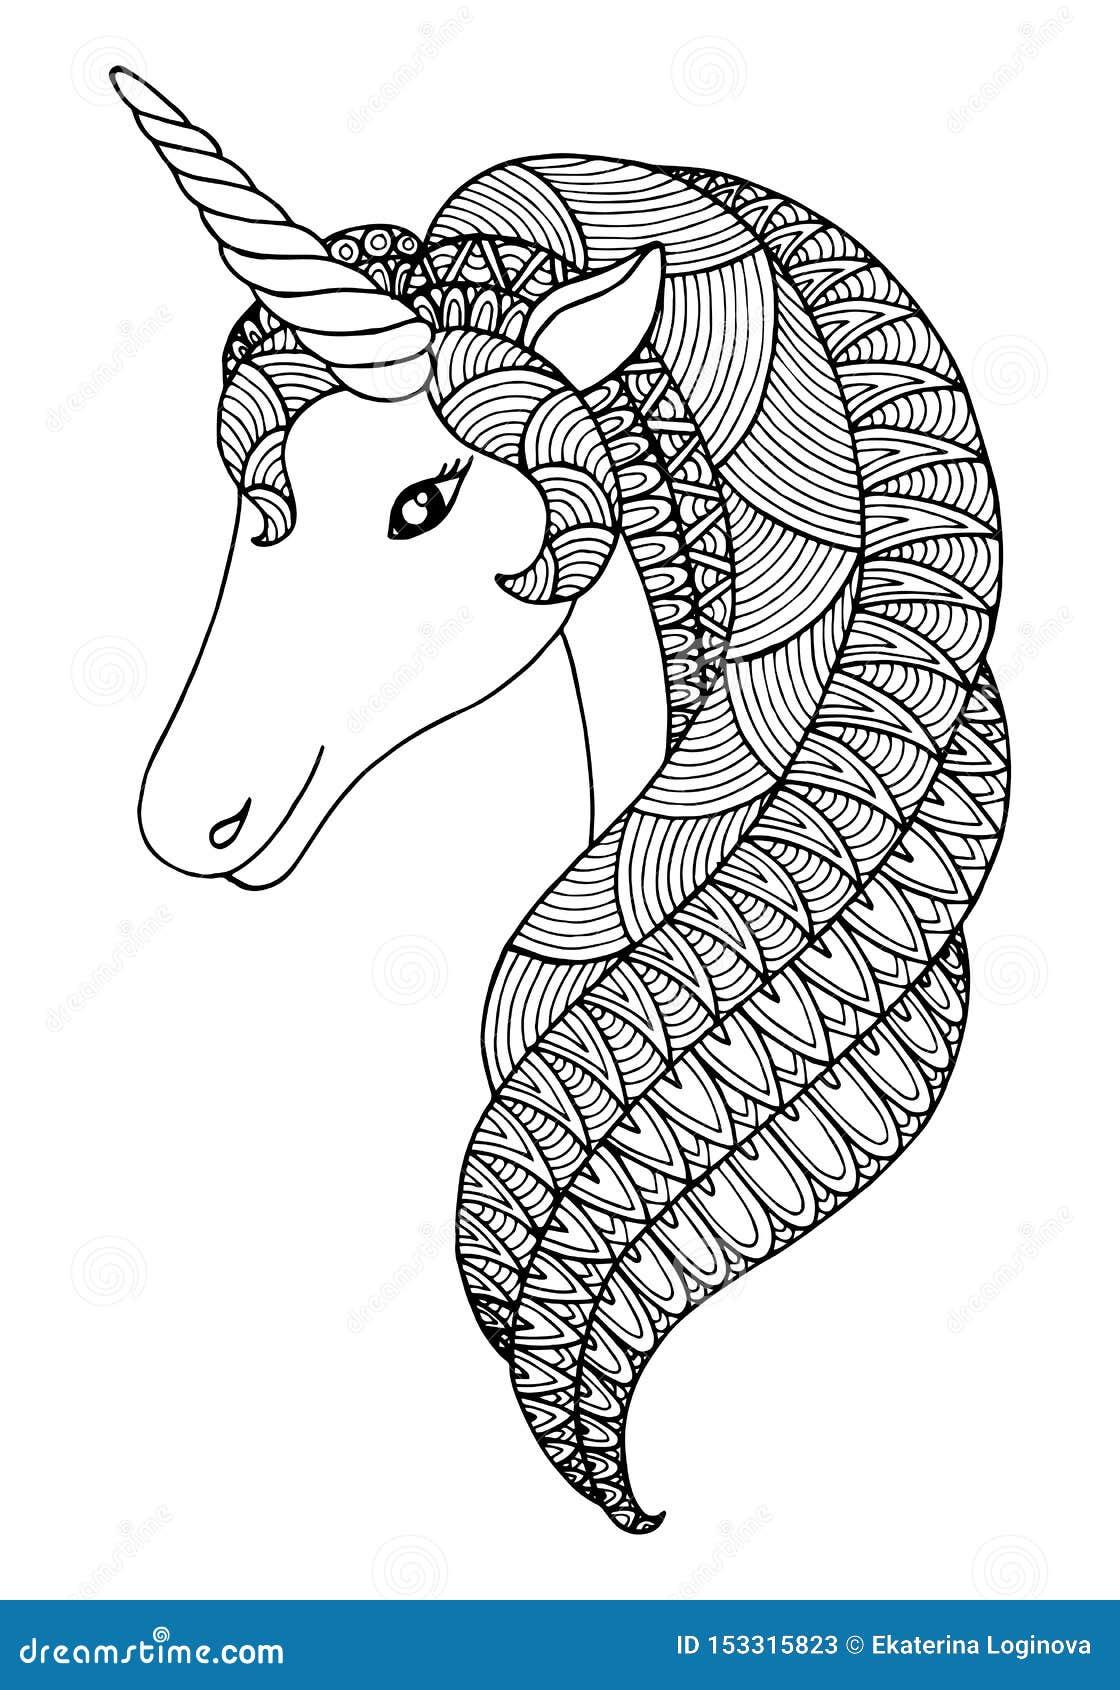 Decorative Zentangle Unicorn Stock Vector - Illustration ...